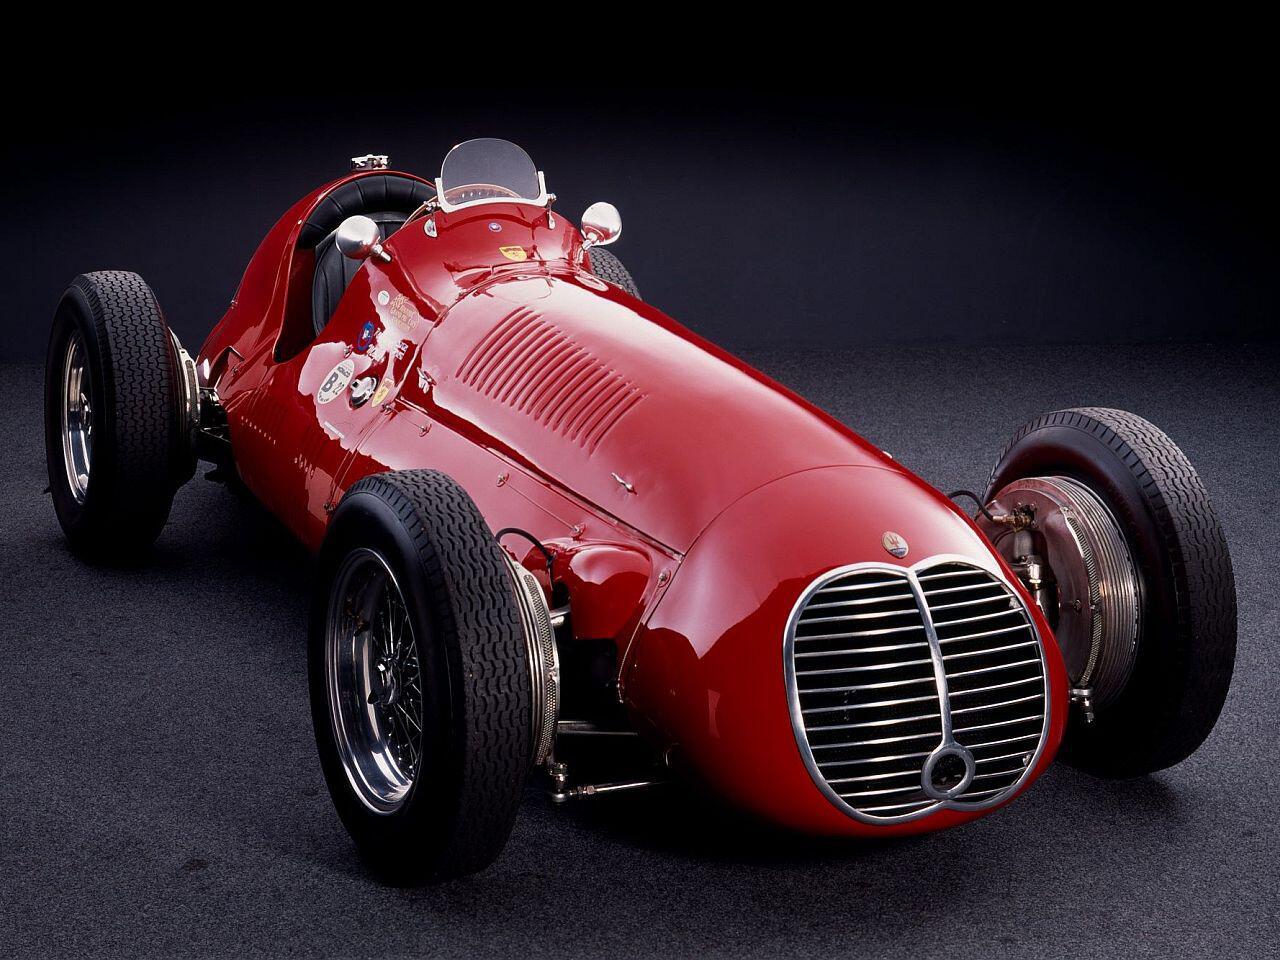 Bild zu Maserati 4CLT Monoposto von 1948